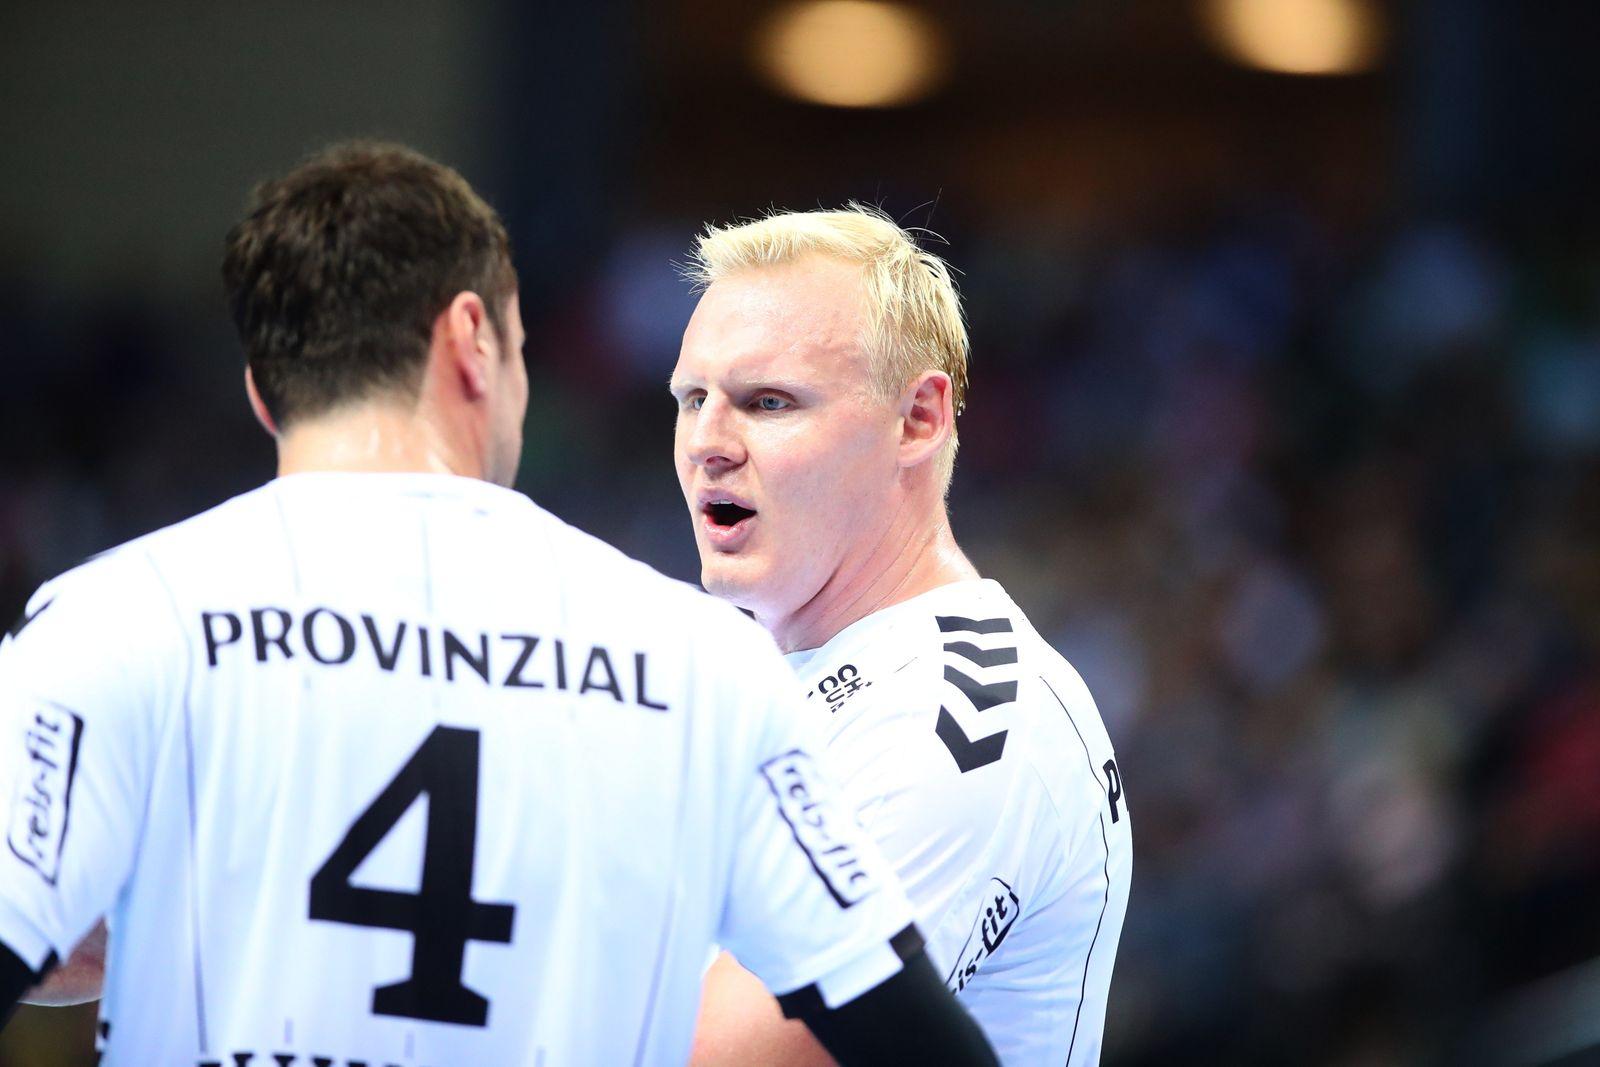 Patrick Wiencek (Kiel, rechts) im Gespraech mit Domagoj Duvnjak (Kiel) HSG Wetzlar vs THW Kiel, Handball, 1. Bundesliga